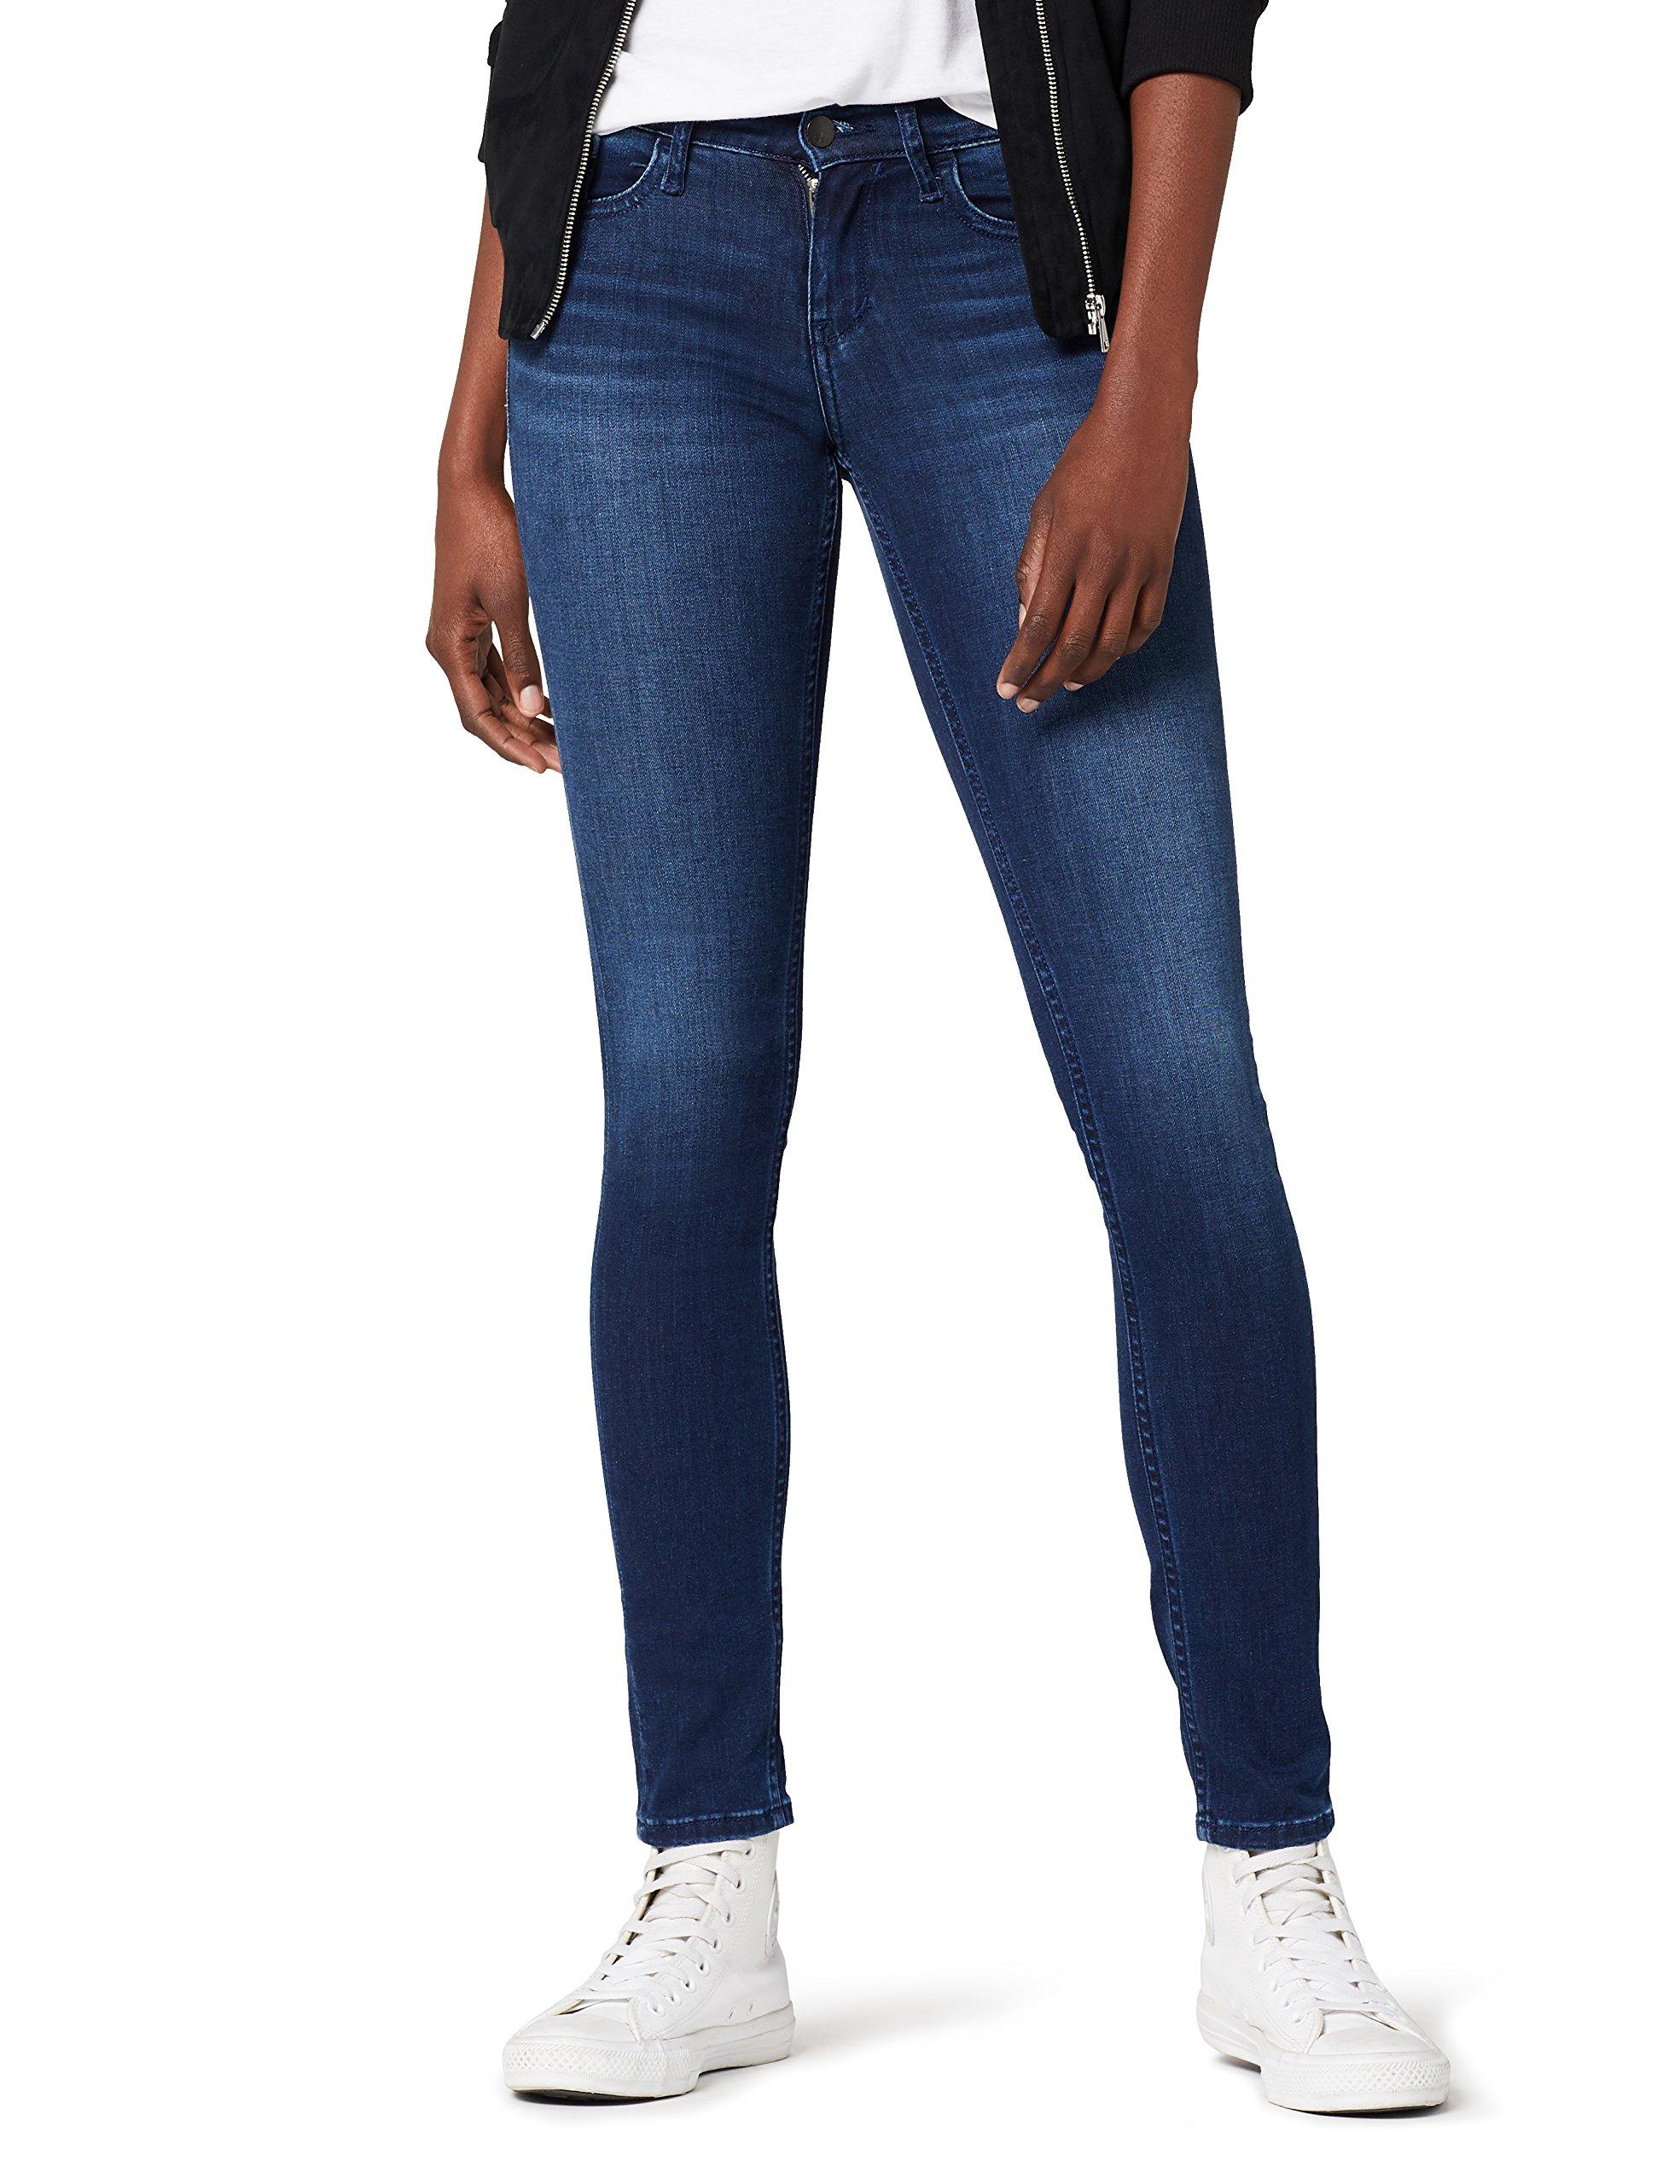 Klein l32 FemmeBleusatin Dark RiseSkinny Jeans Mid Stretch FabricantW26 l32taille Calvin 814W26 wn0OkX8P